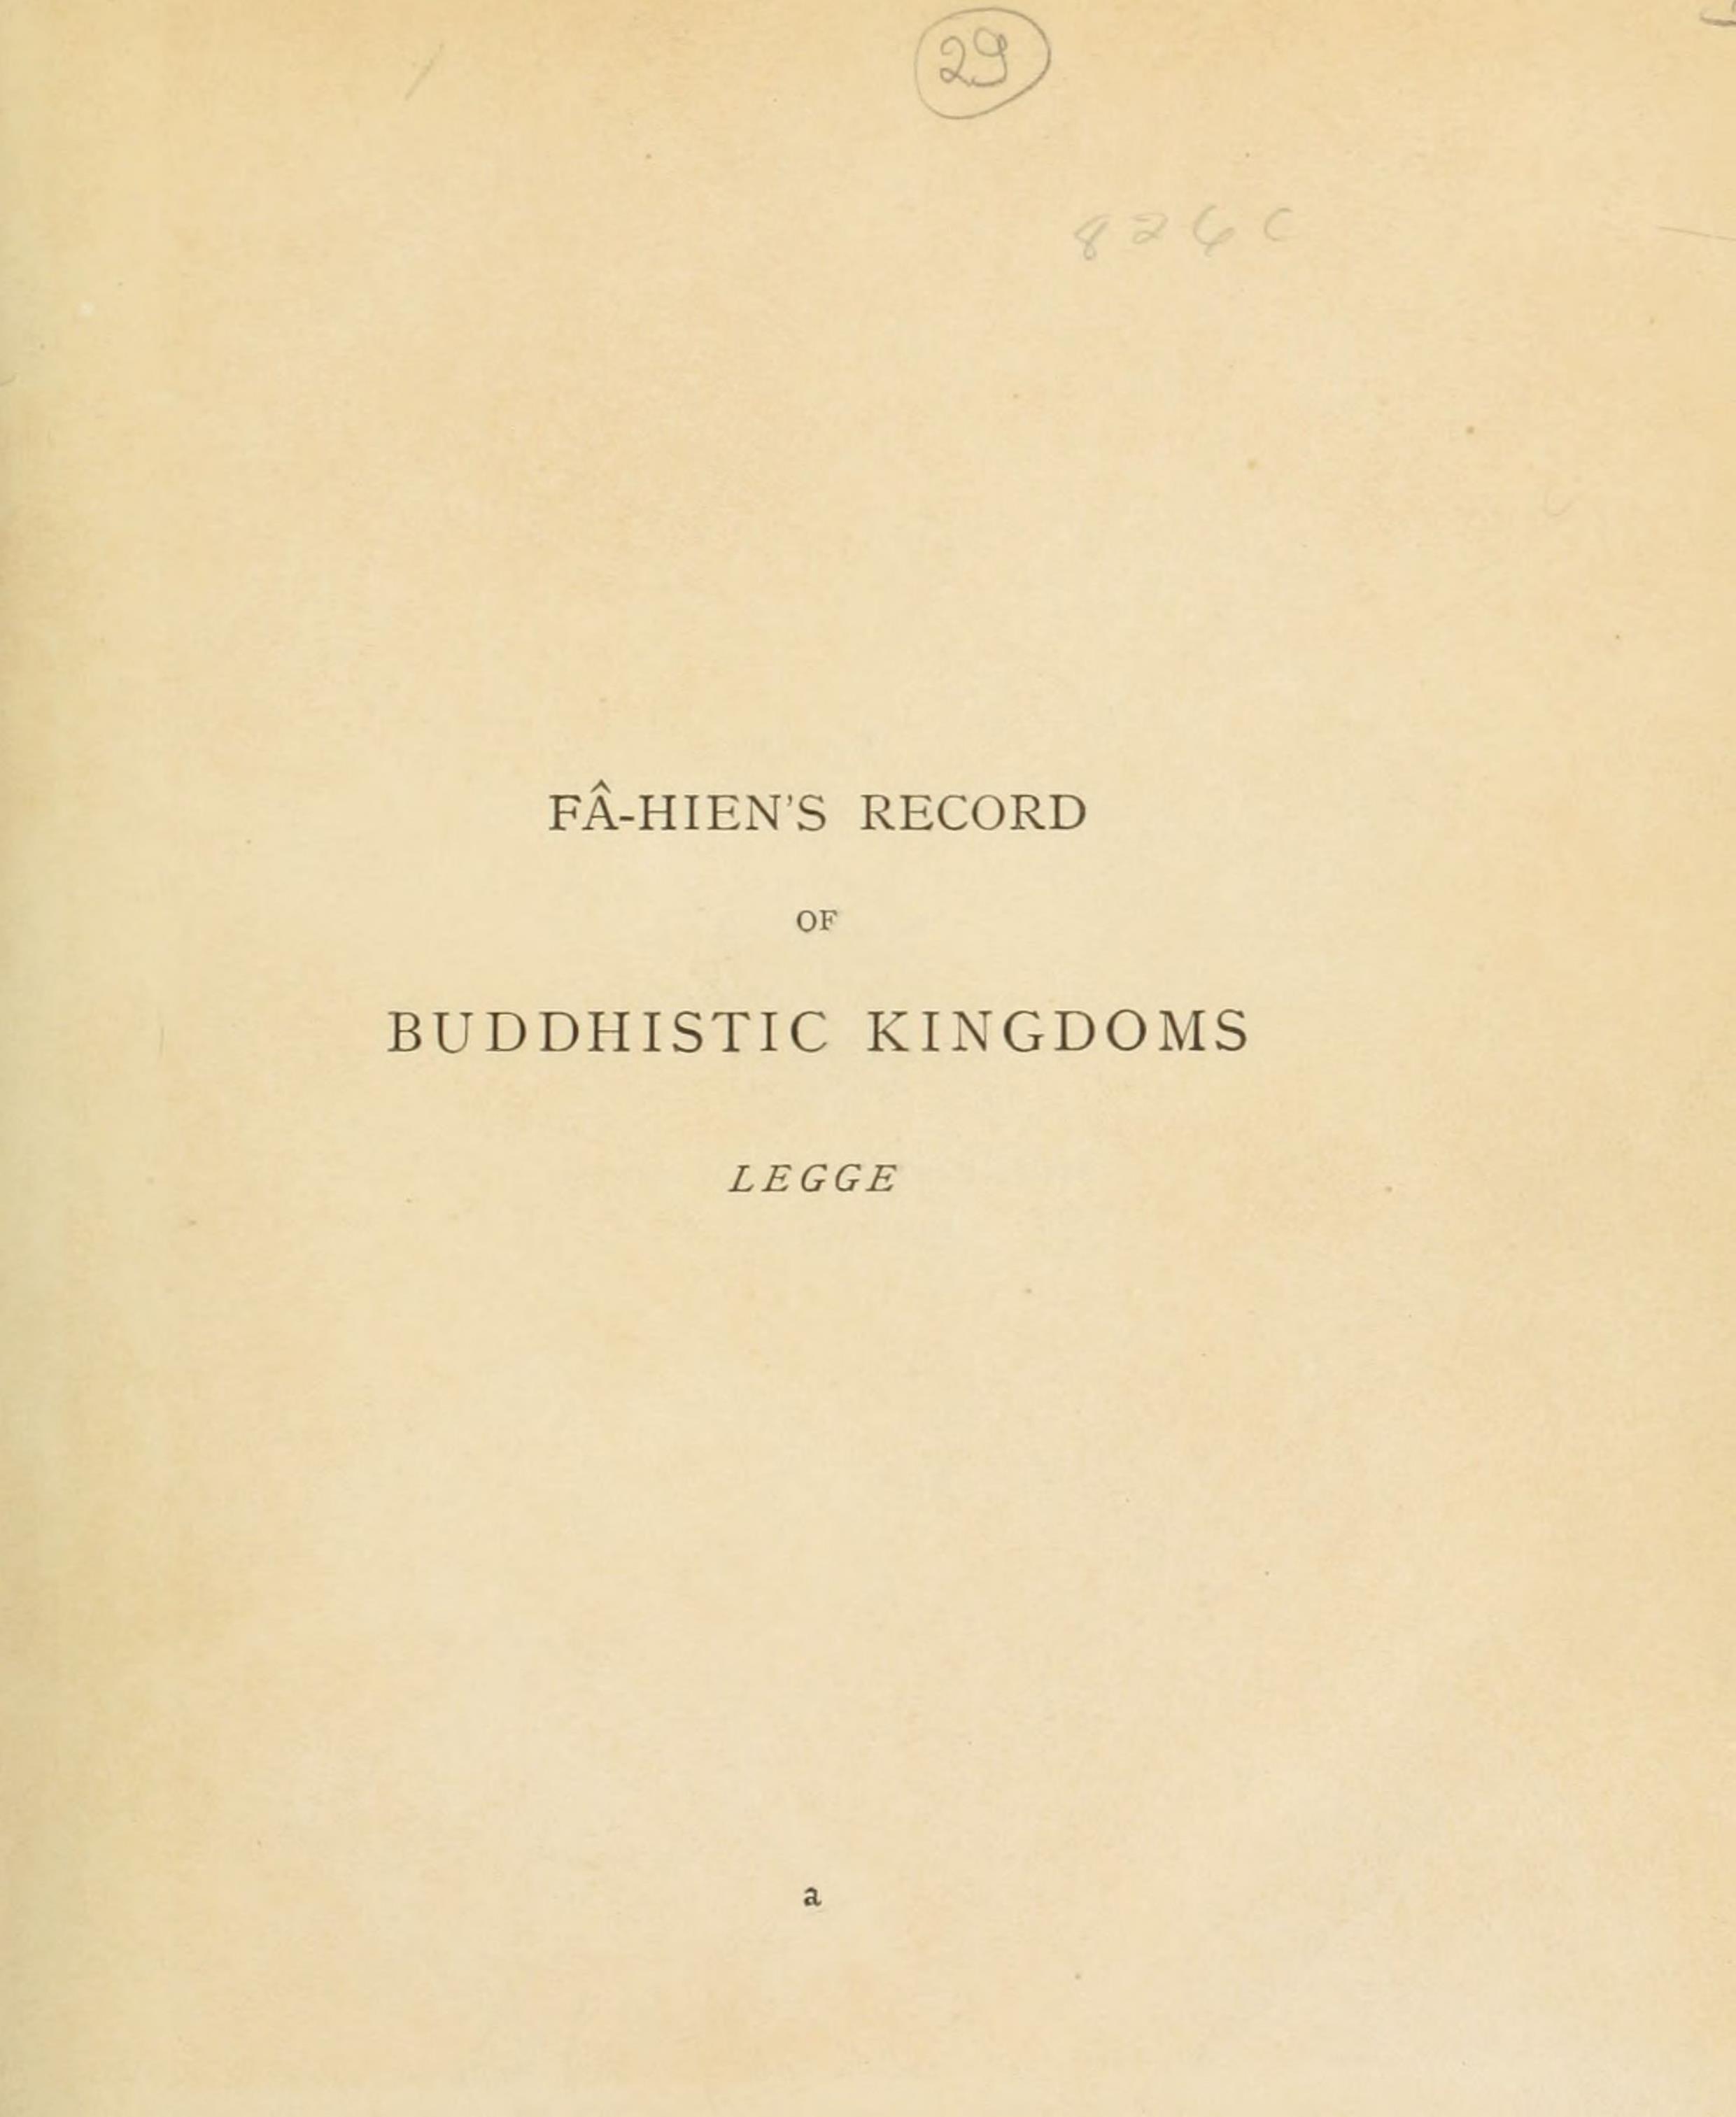 法显传.A Record of Buddhistic Kingdoms.法显著.By James Legge.理雅各译.中英文.1886年